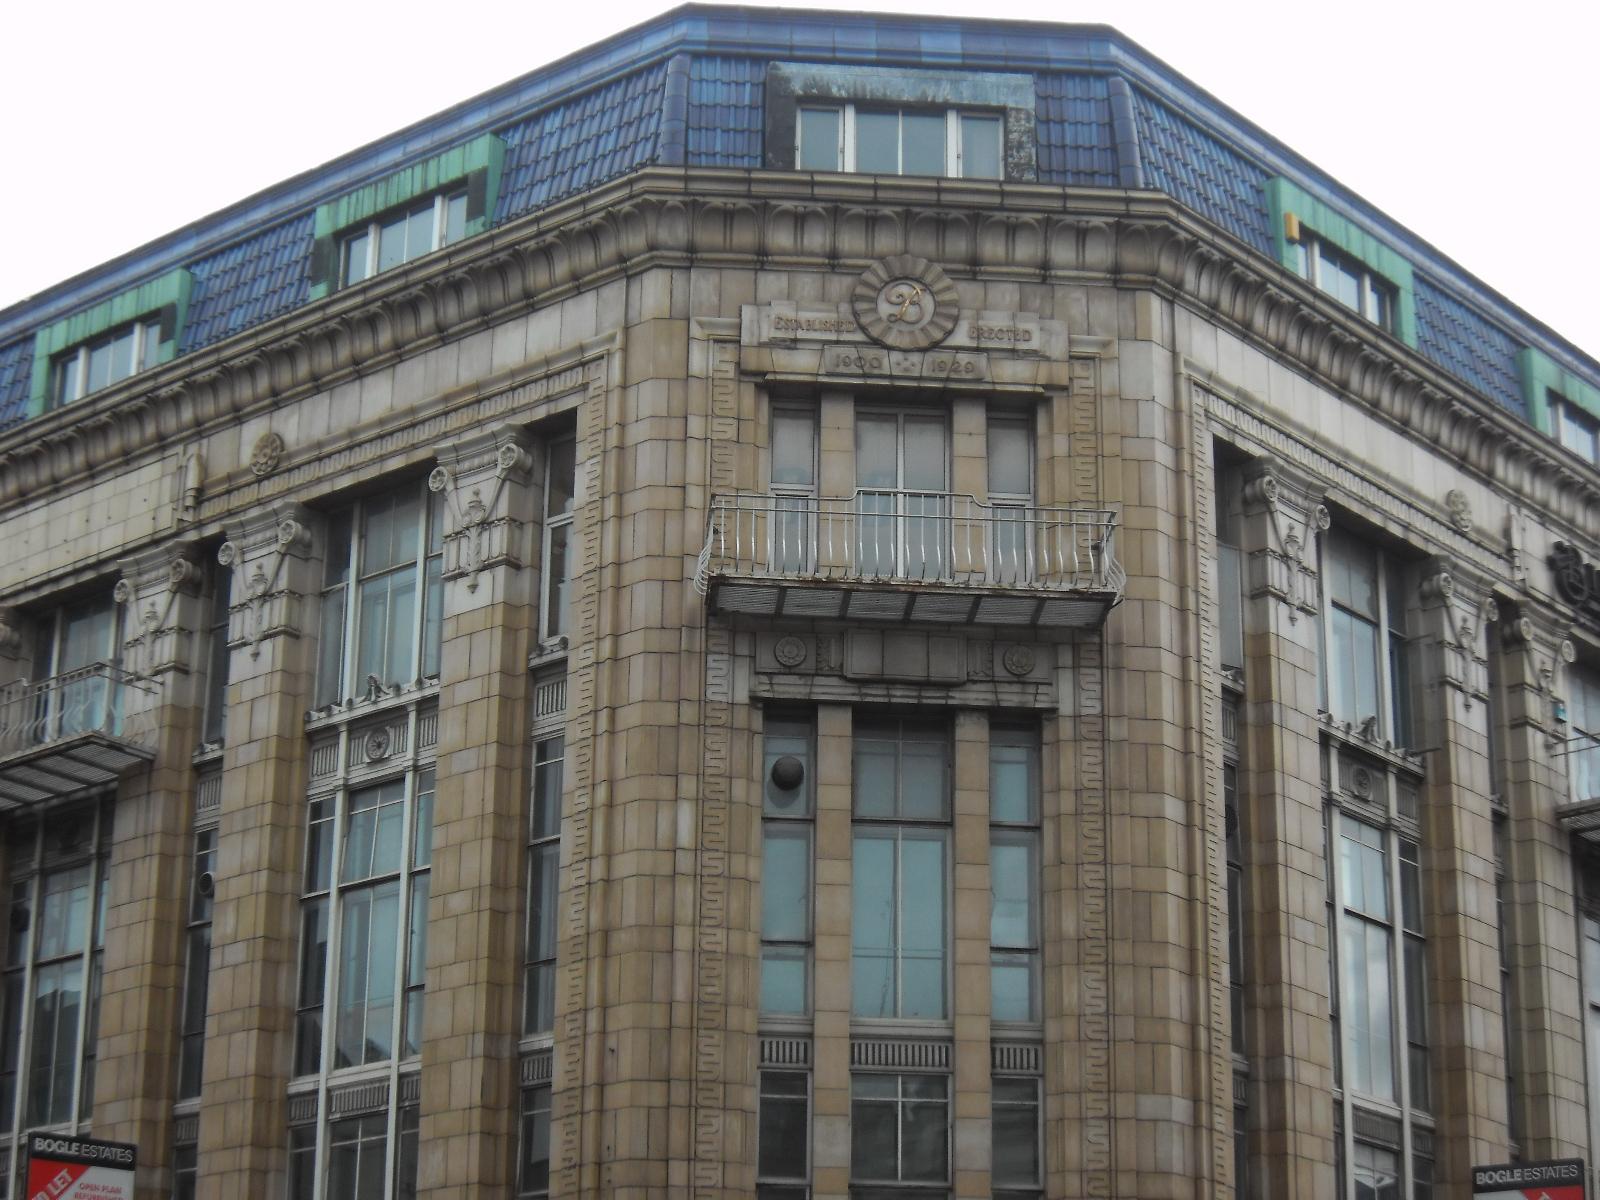 Former Burton Men Department Store With Store Deco